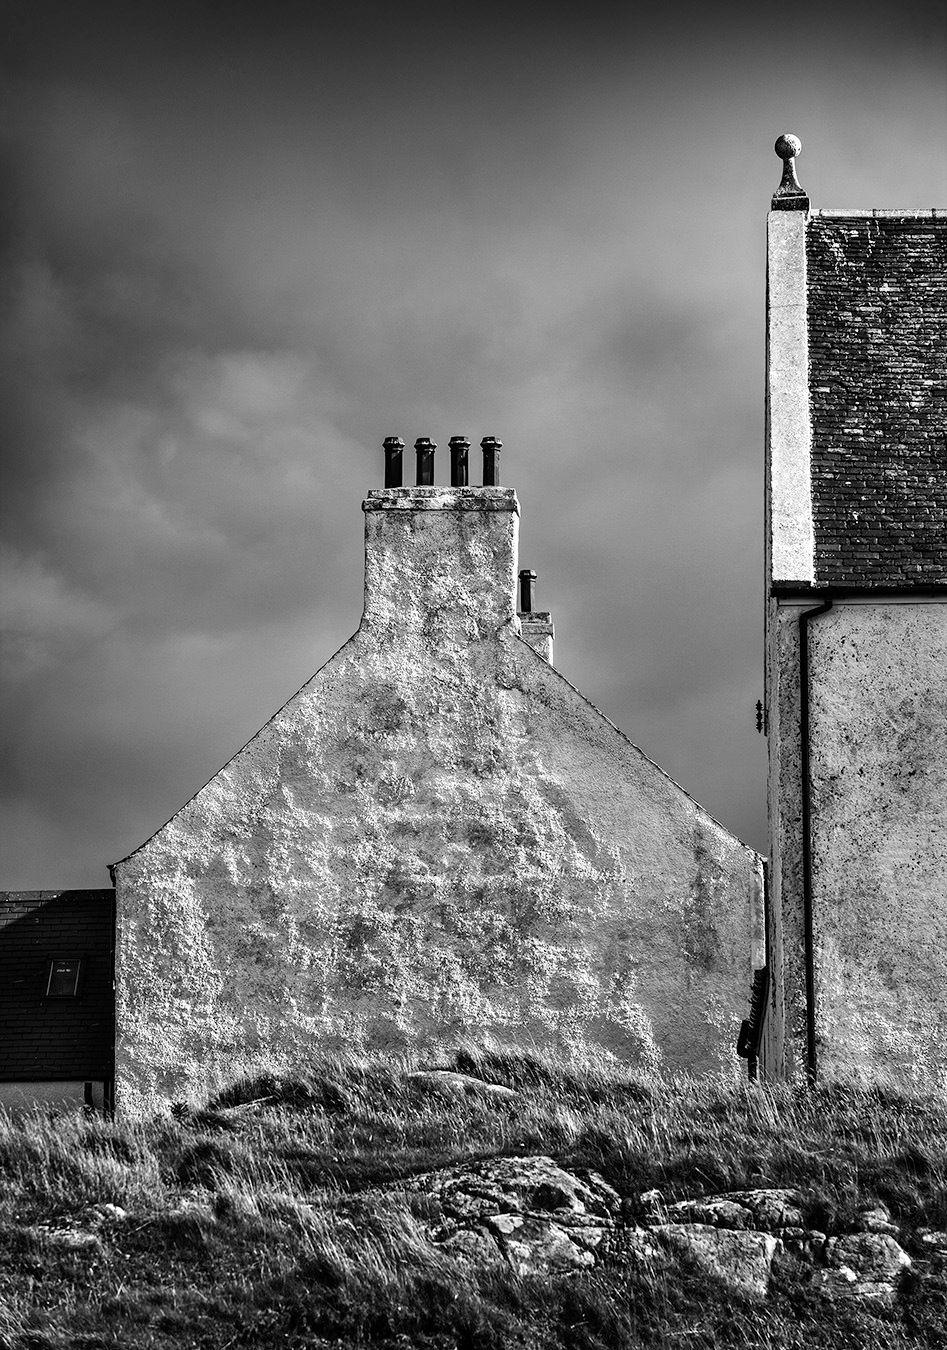 Daiberigh Light, Outer Hebrides, Scotland